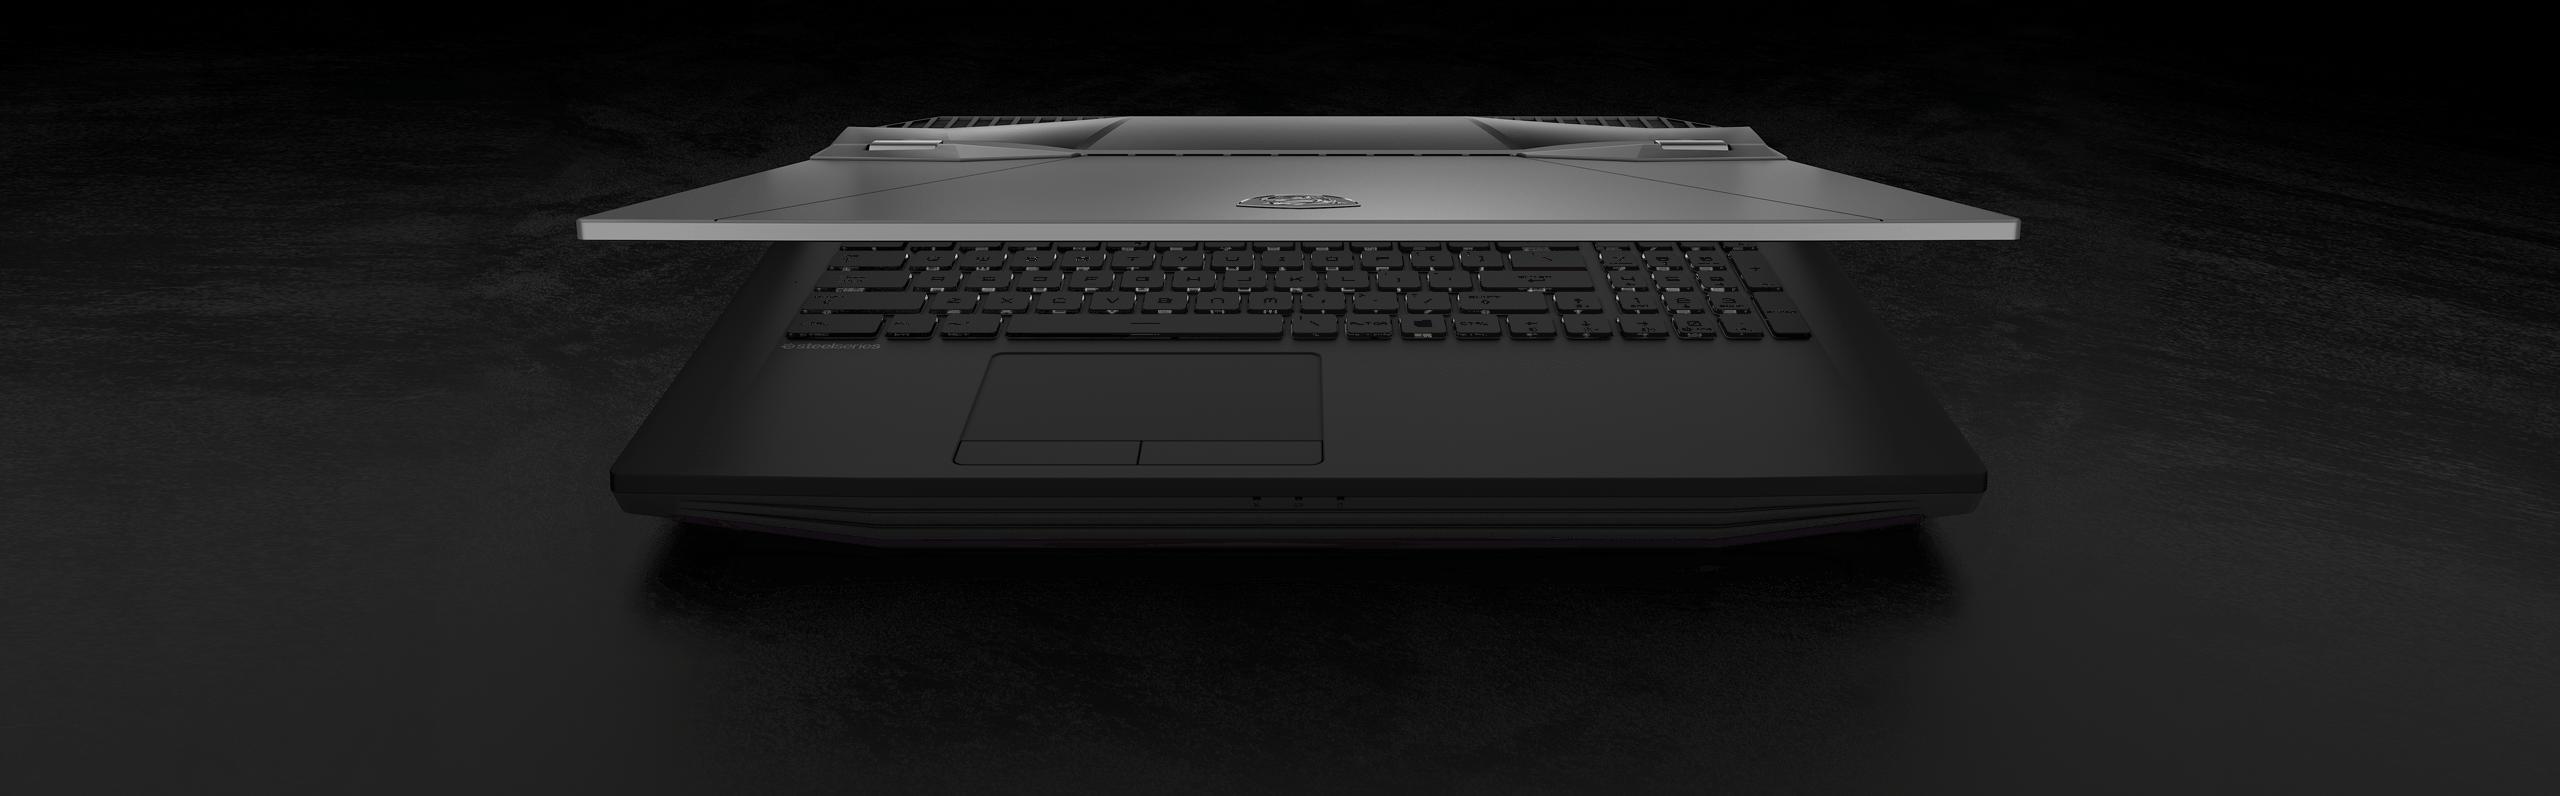 MSI GT76 Titan Core i7 RTX 2070 Super Laptop With 48GB RAM